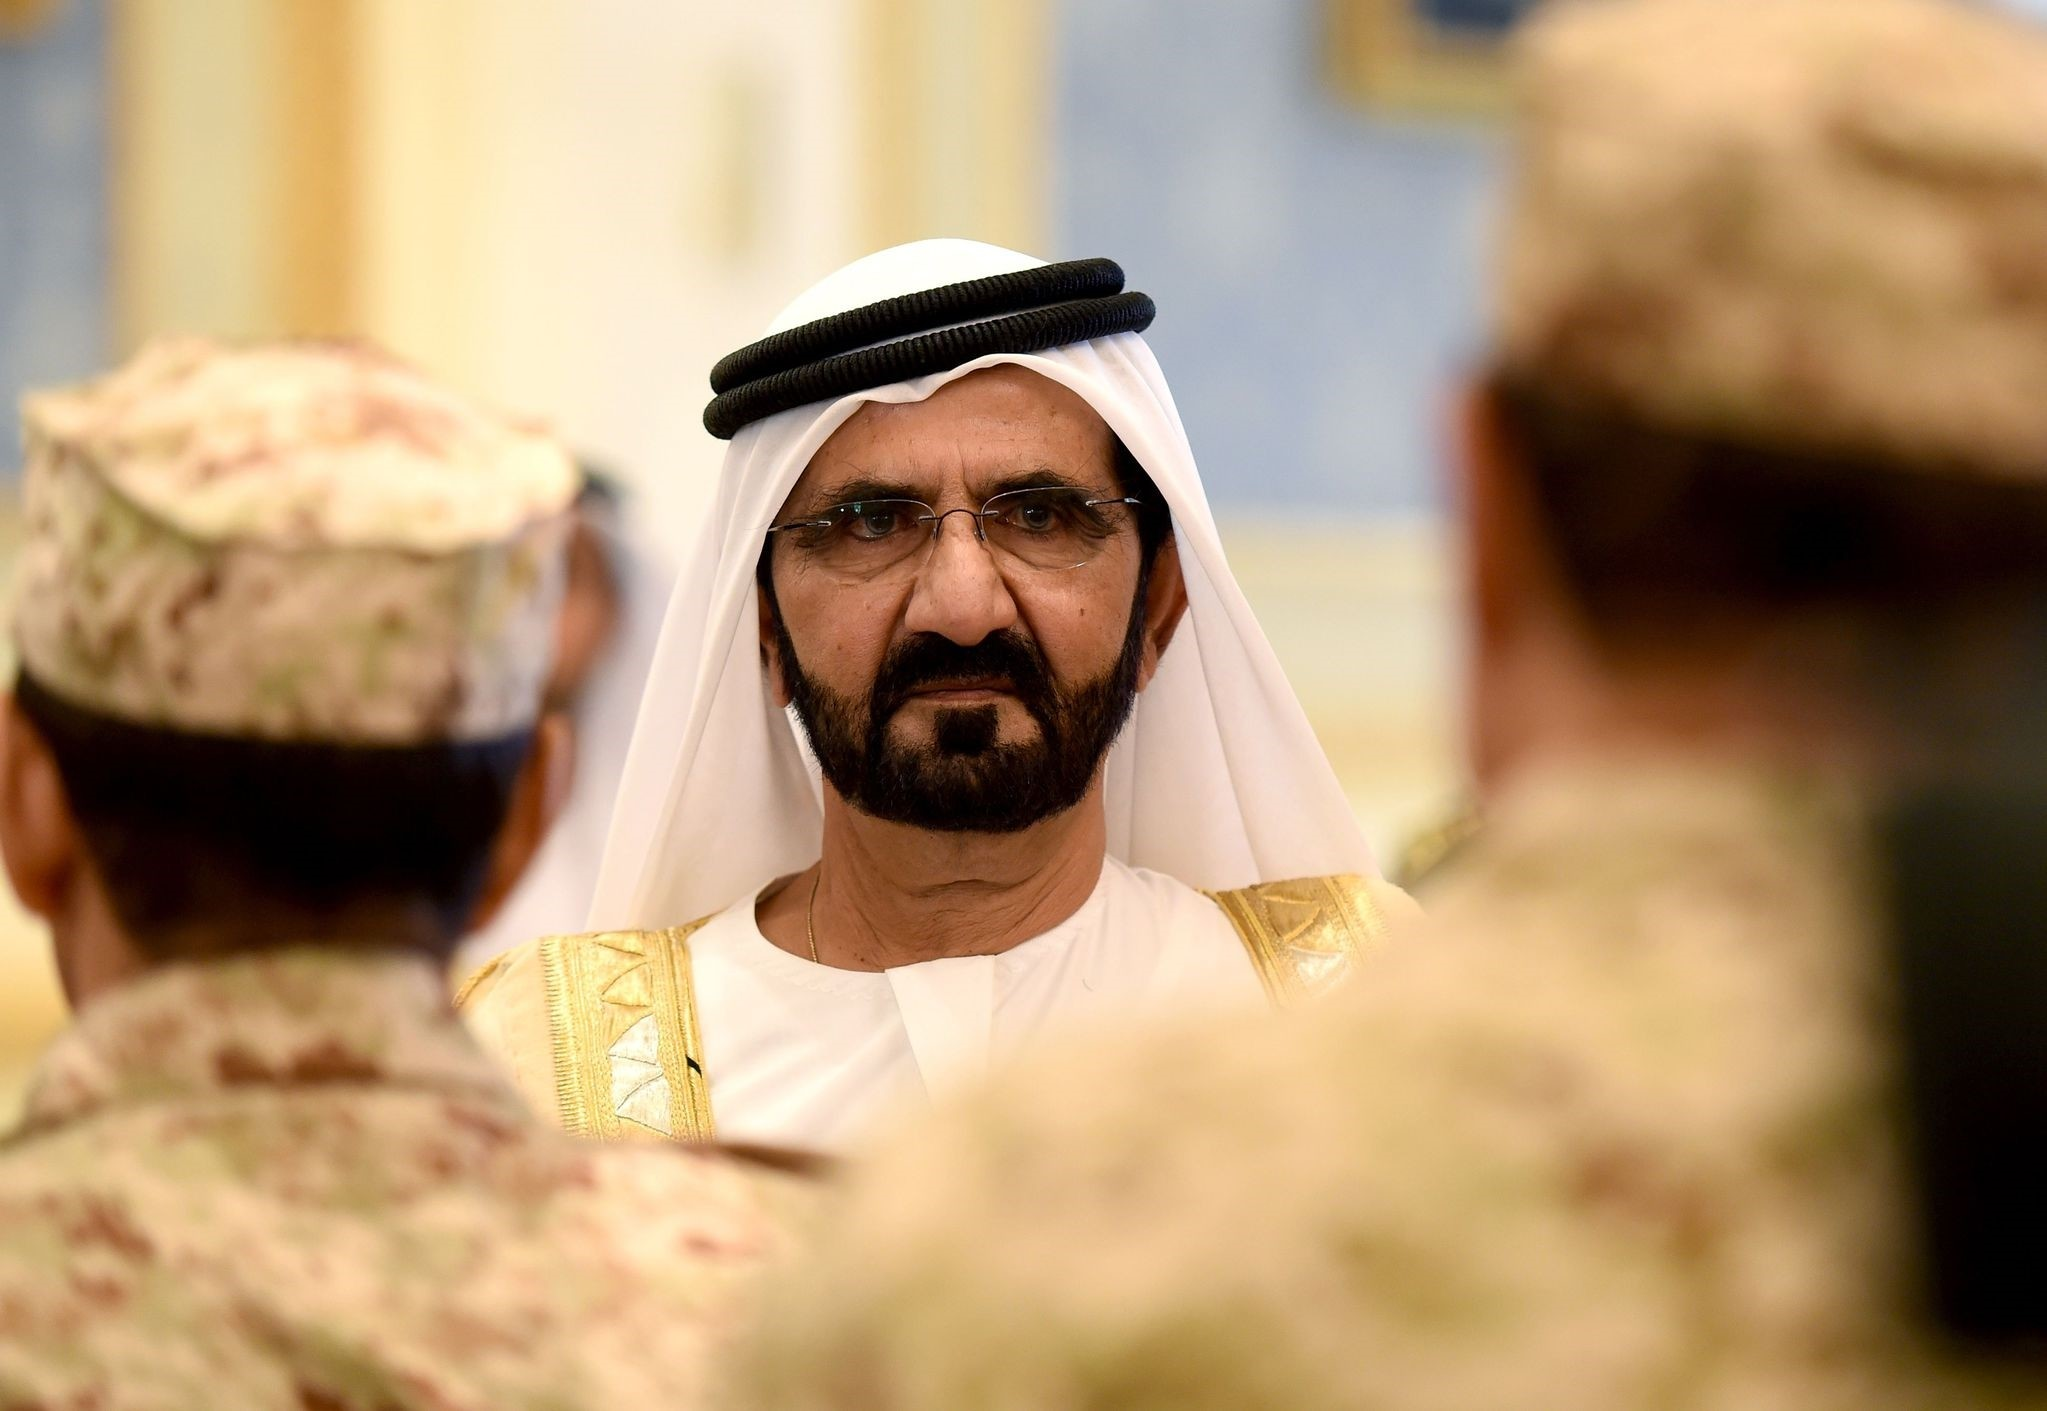 Sheikh Mohammed Bin Rashid Al Maktoum, Vice President and Prime Minister of the United Arab Emirates and ruler of Dubai.